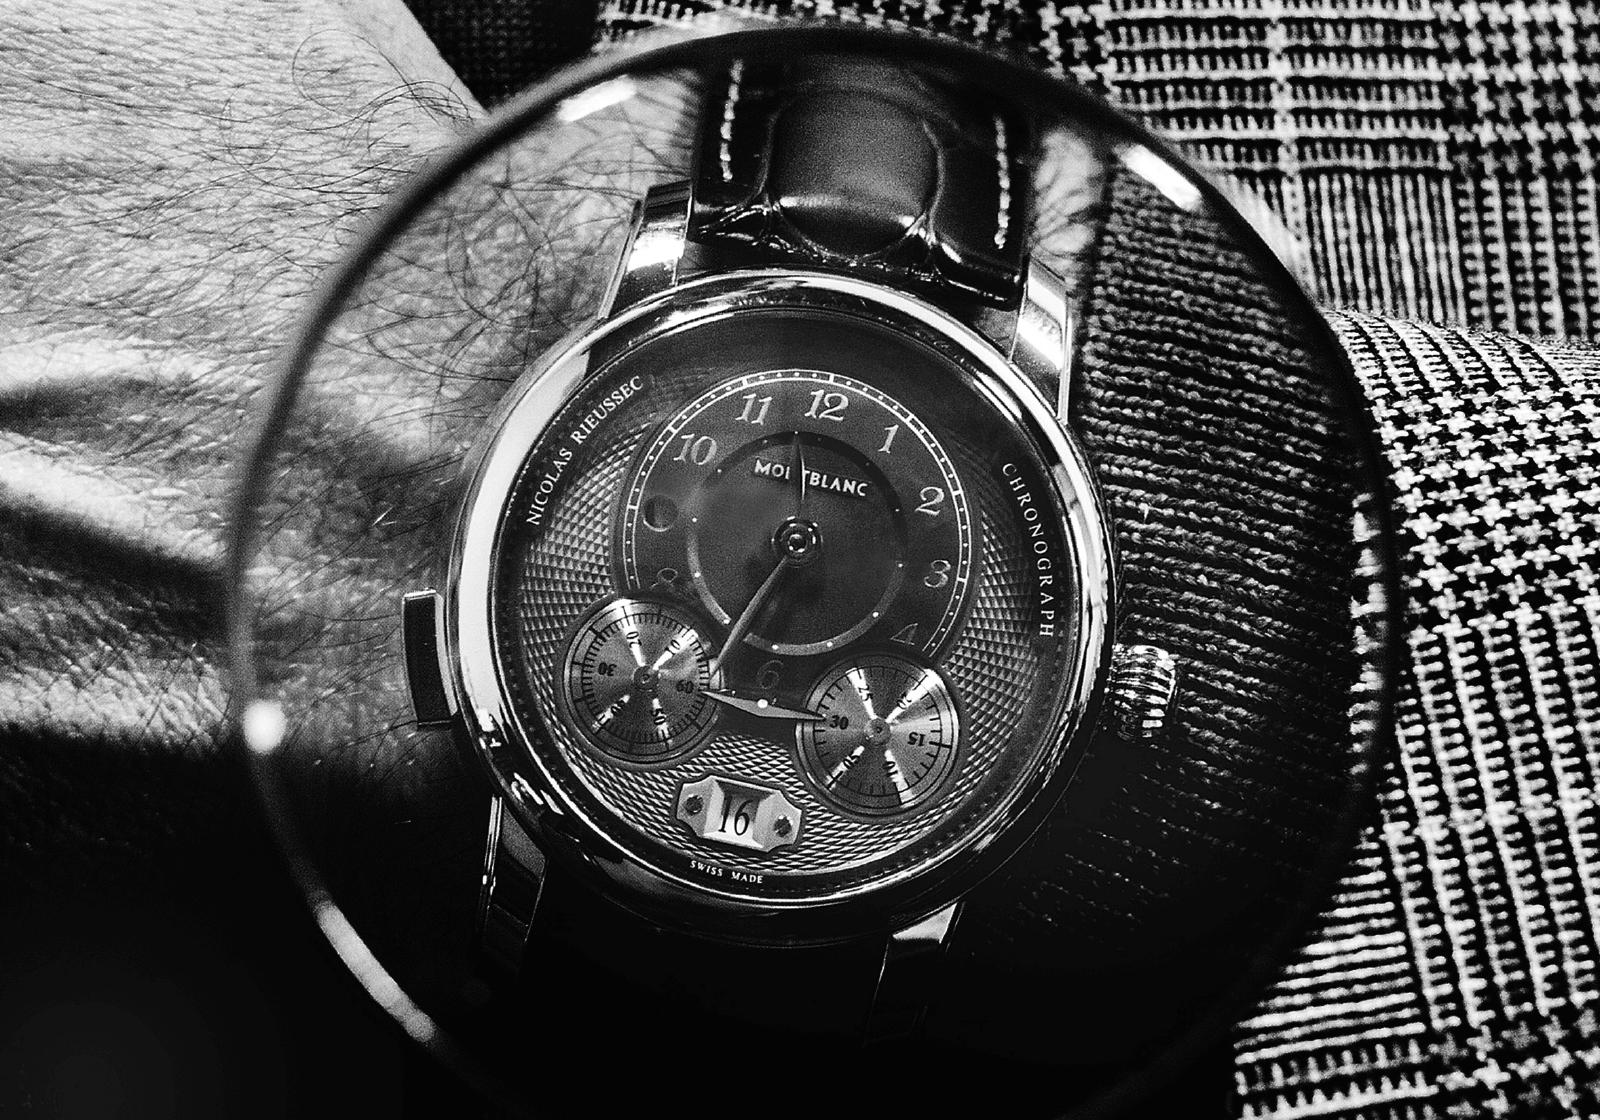 Montblanc | Star Legacy Nicolas Rieussec Chronograph Ref. 119954 | Corda Automática | Aço | Ø 44,8 mm | Relógio cedido por Montblanc © Paulo Pires / Espiral do Tempo